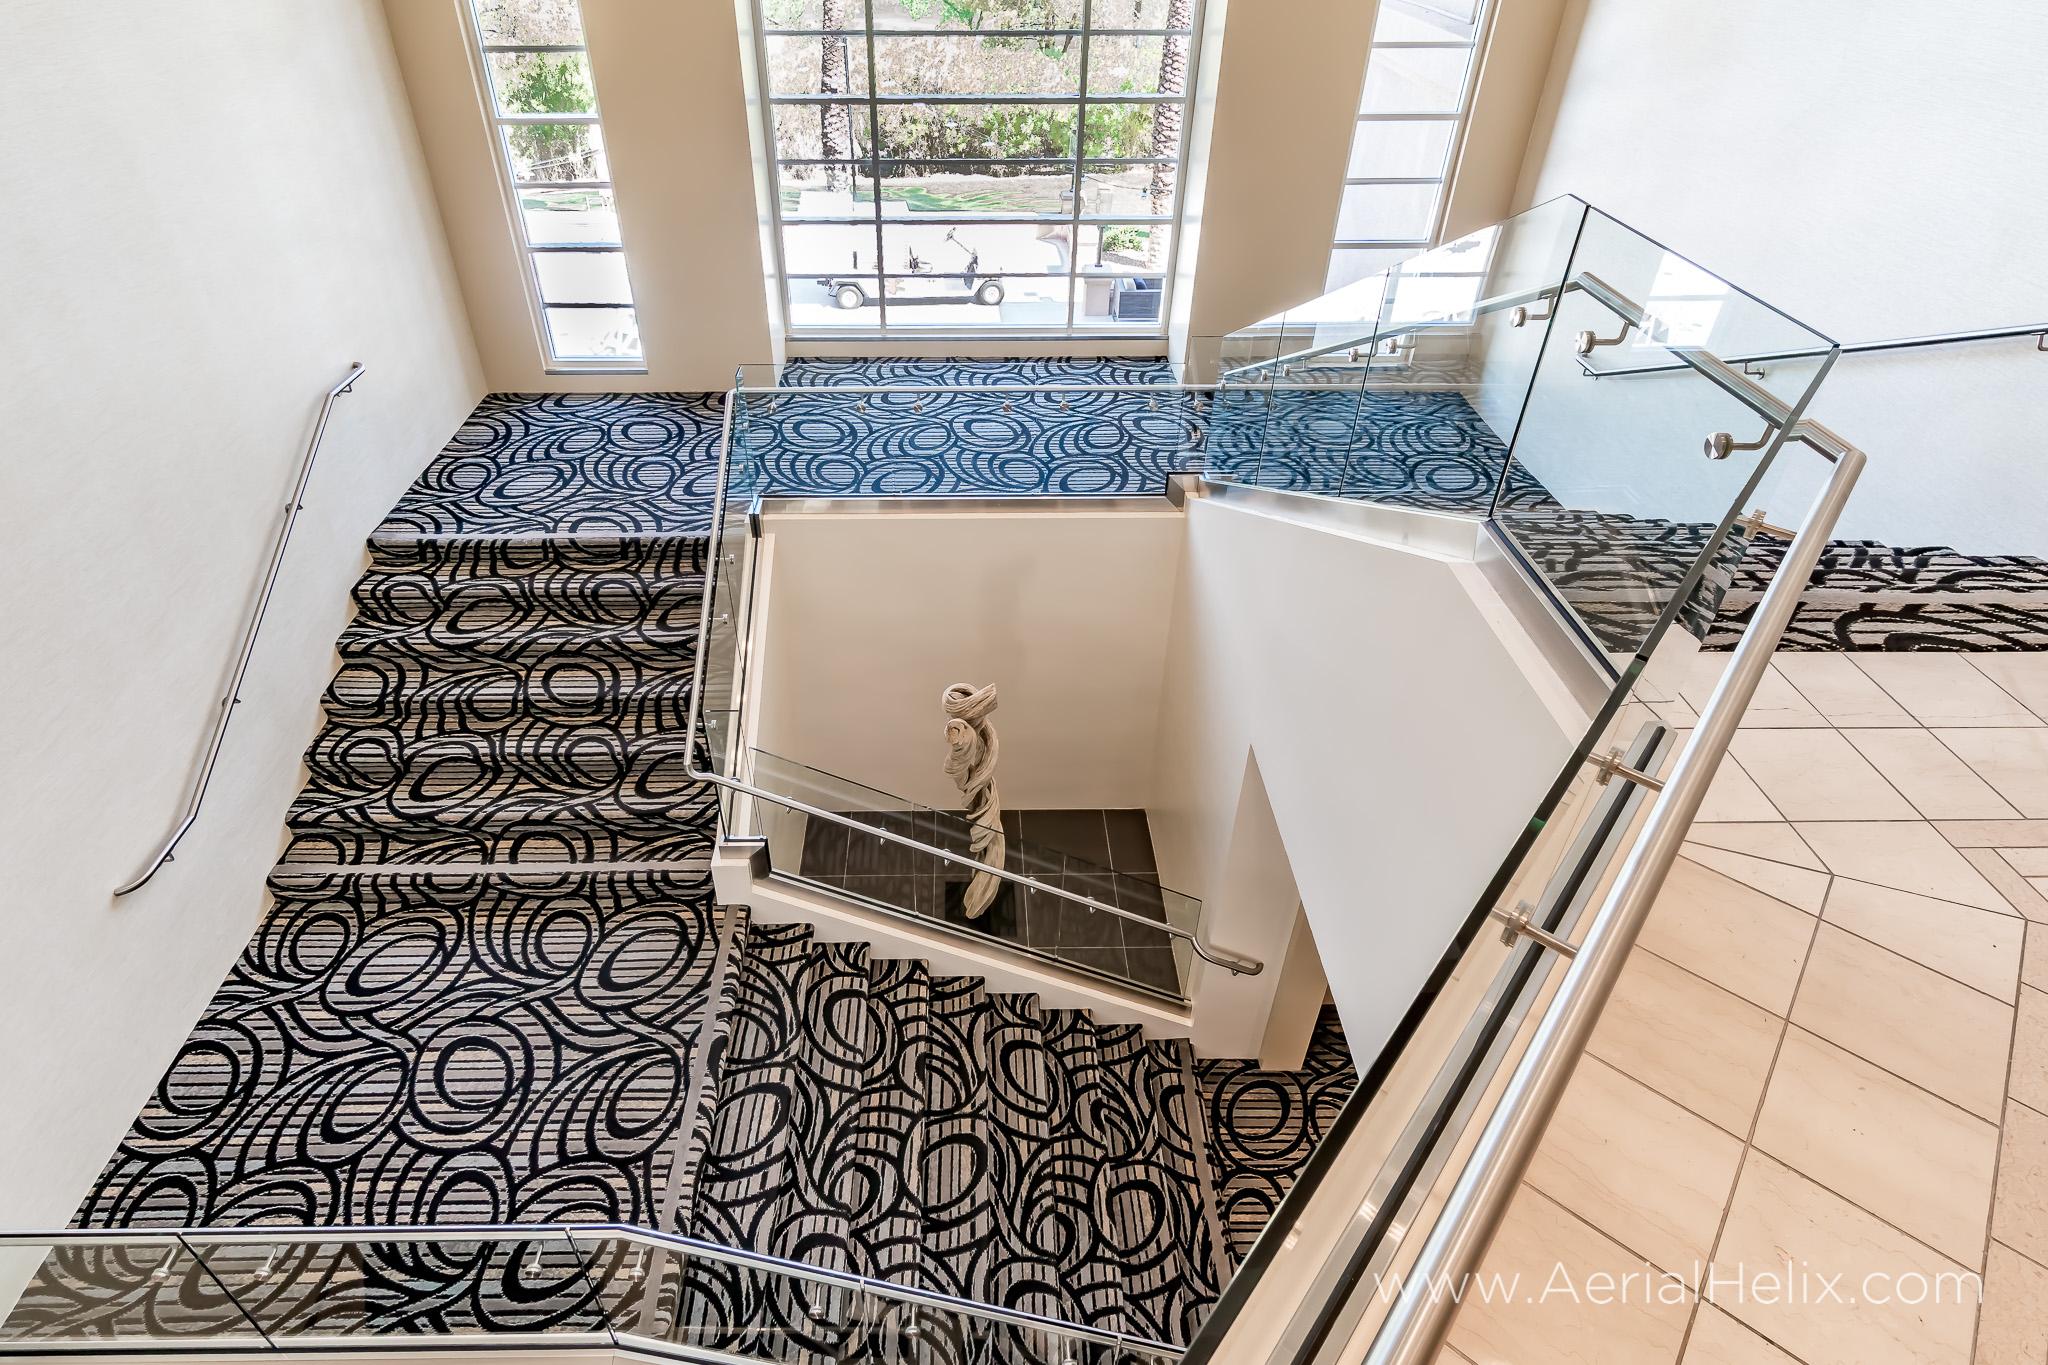 Indian Wells Hyatt Regency Set 1-105.jpg